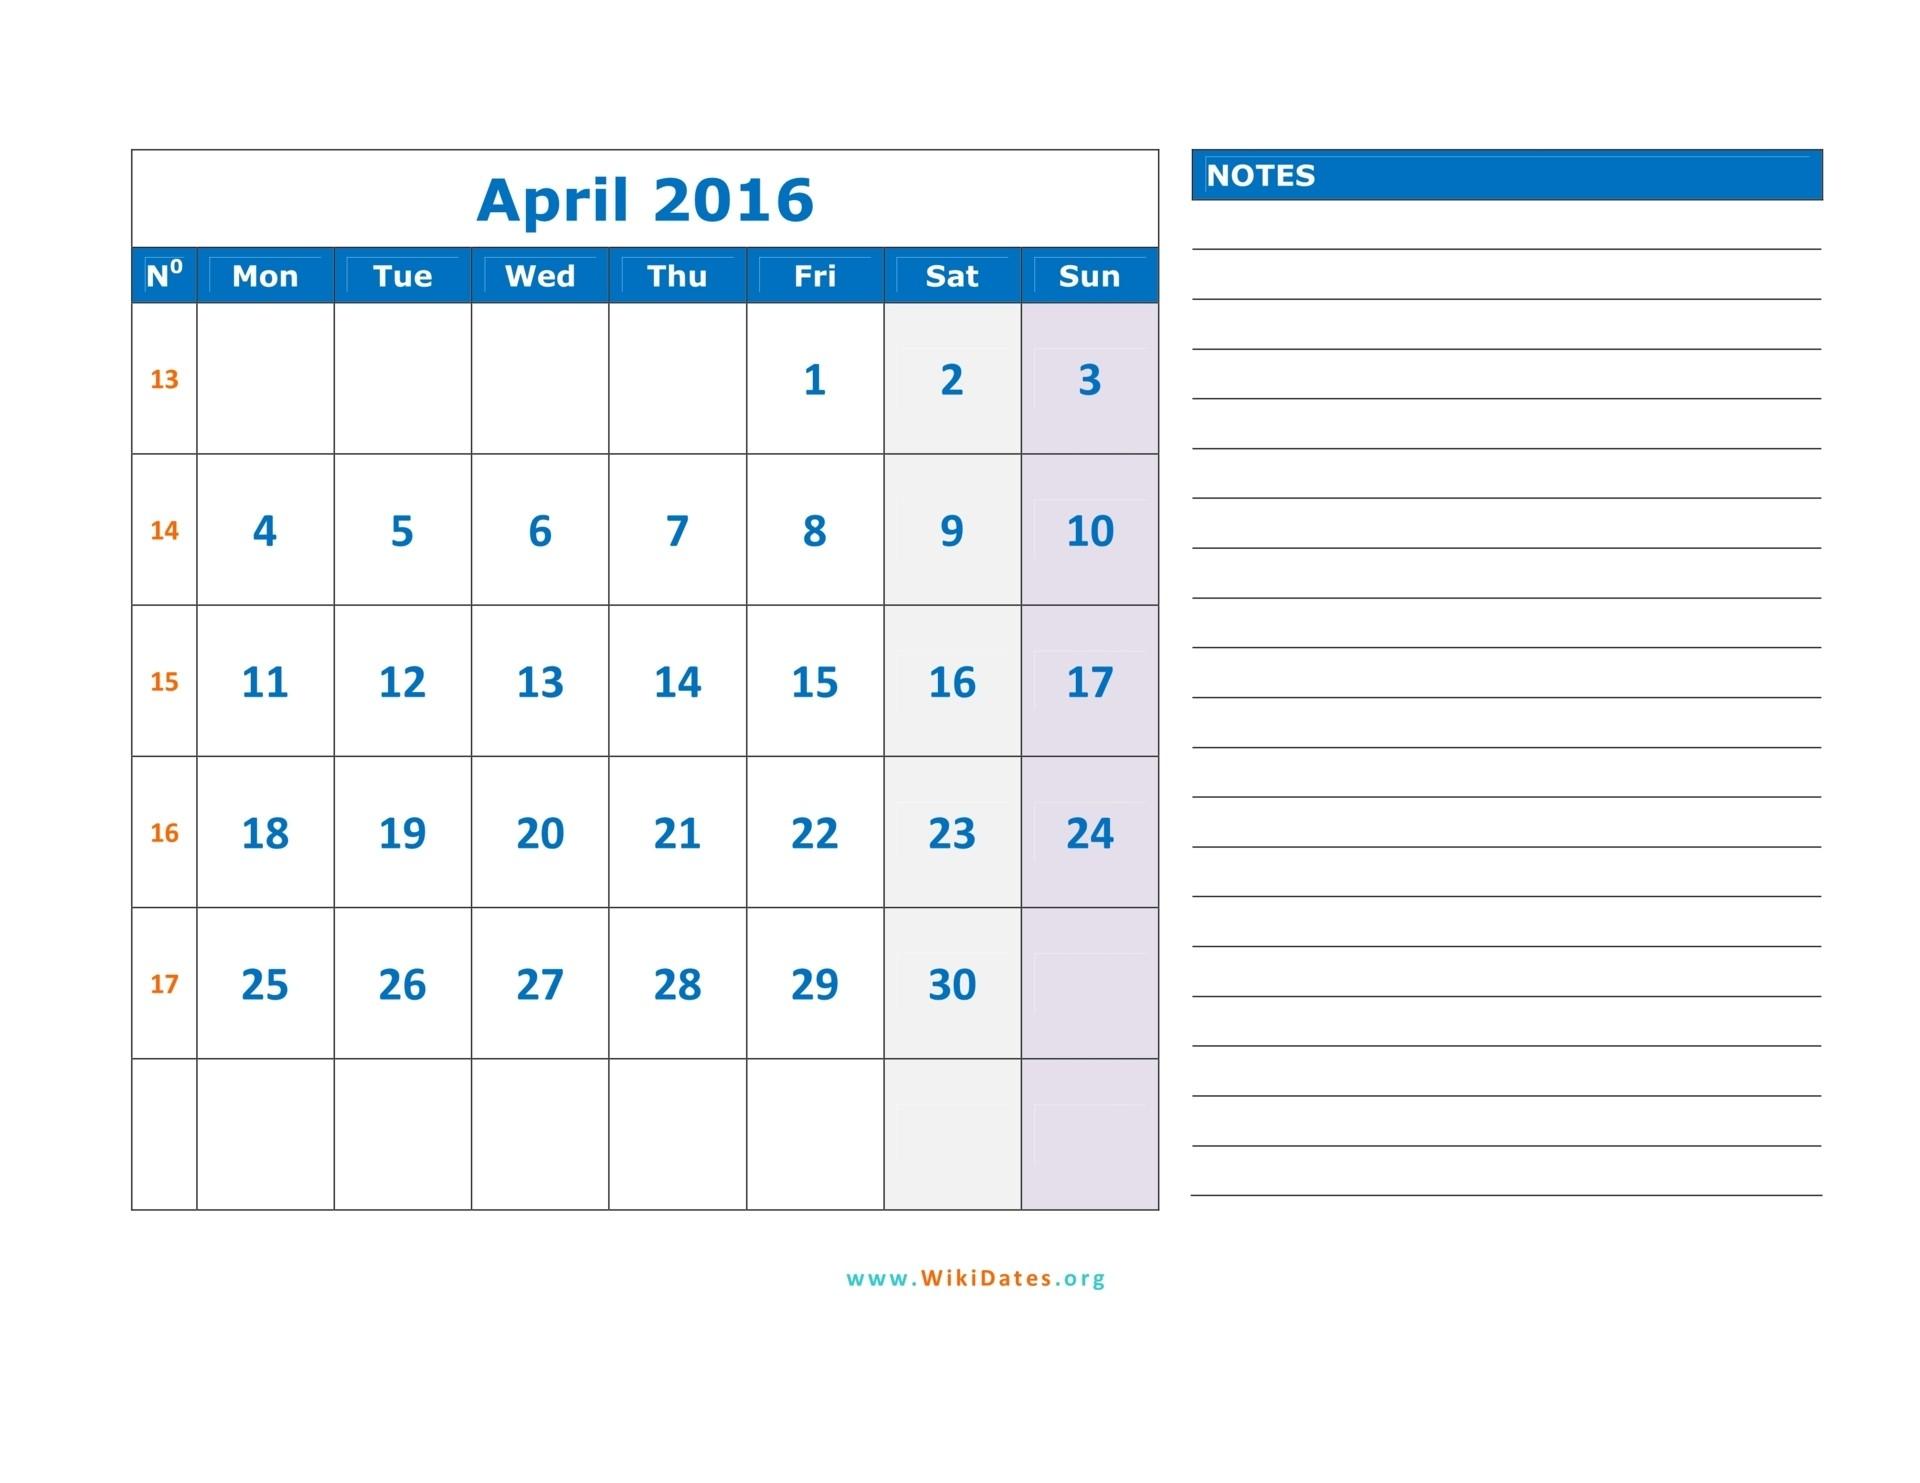 12 month calendar template 2019  April 2016 Calendar   WikiDates